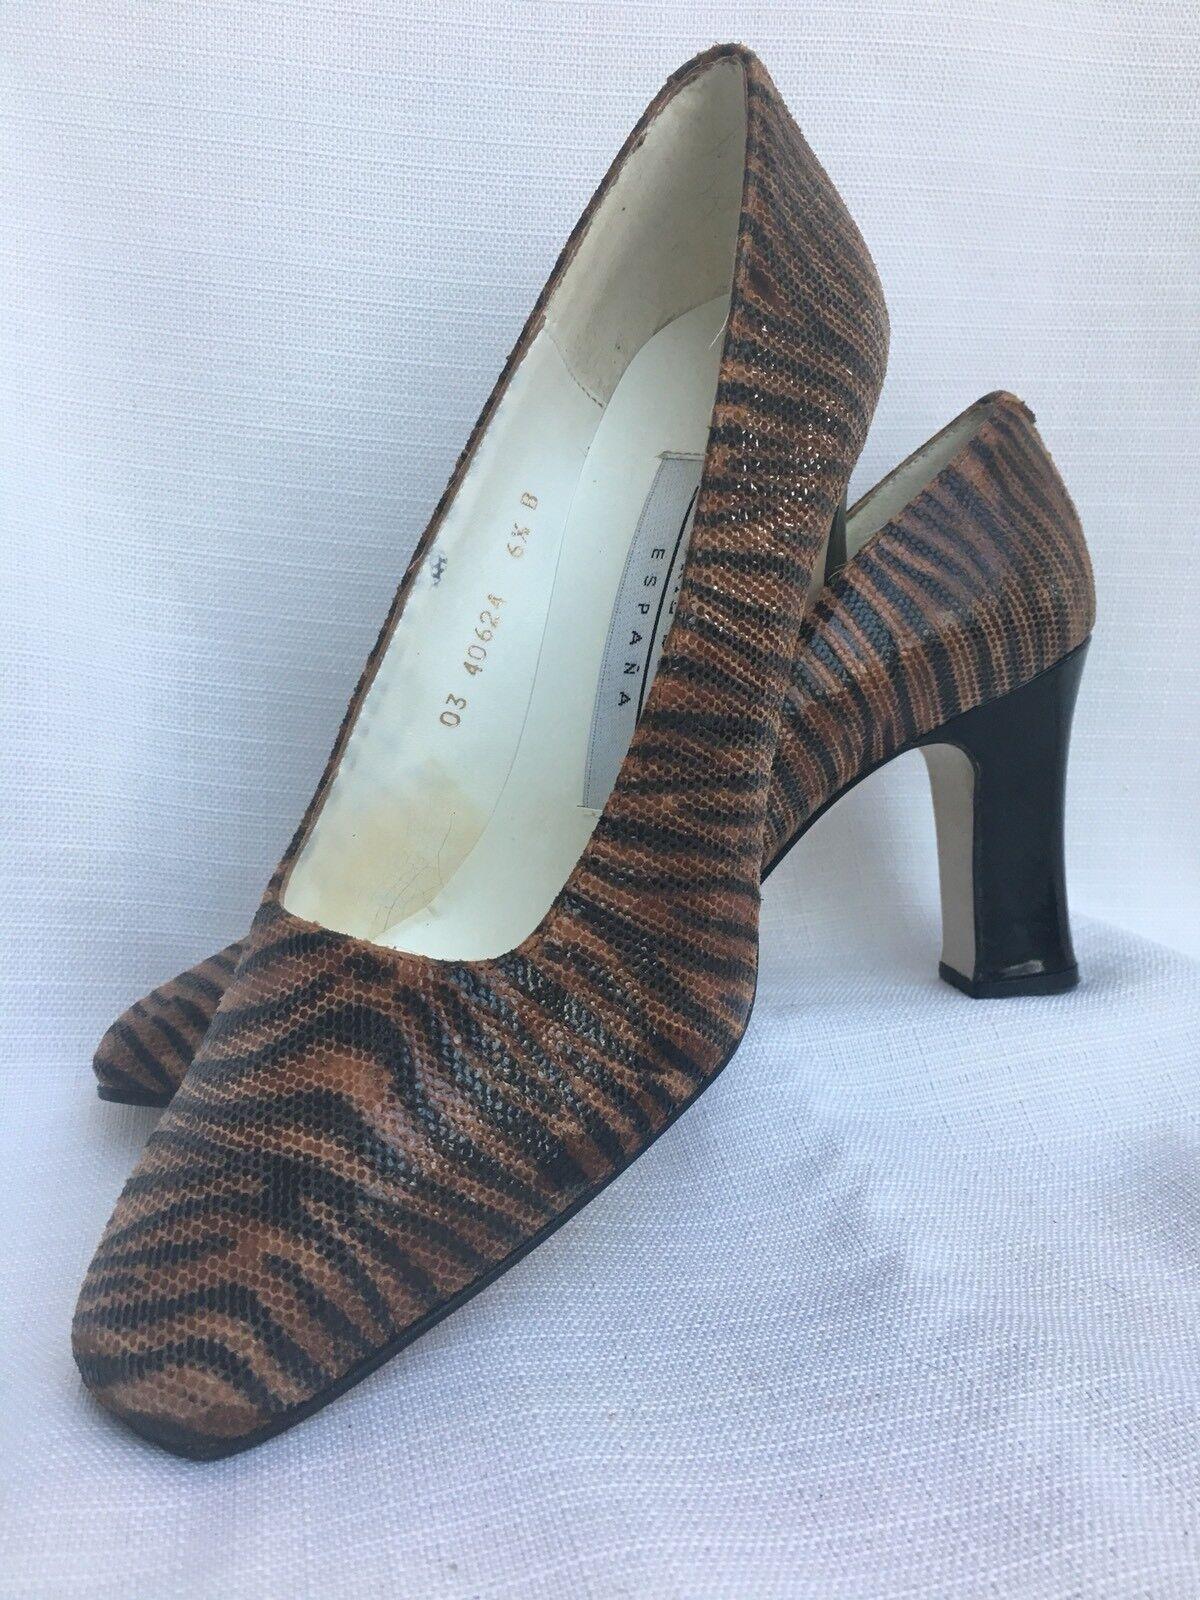 shoes VALERIE STEVENS 3  Square Toe Pump BROWN BLACK TIGER PRINT Angel 6.5 B M